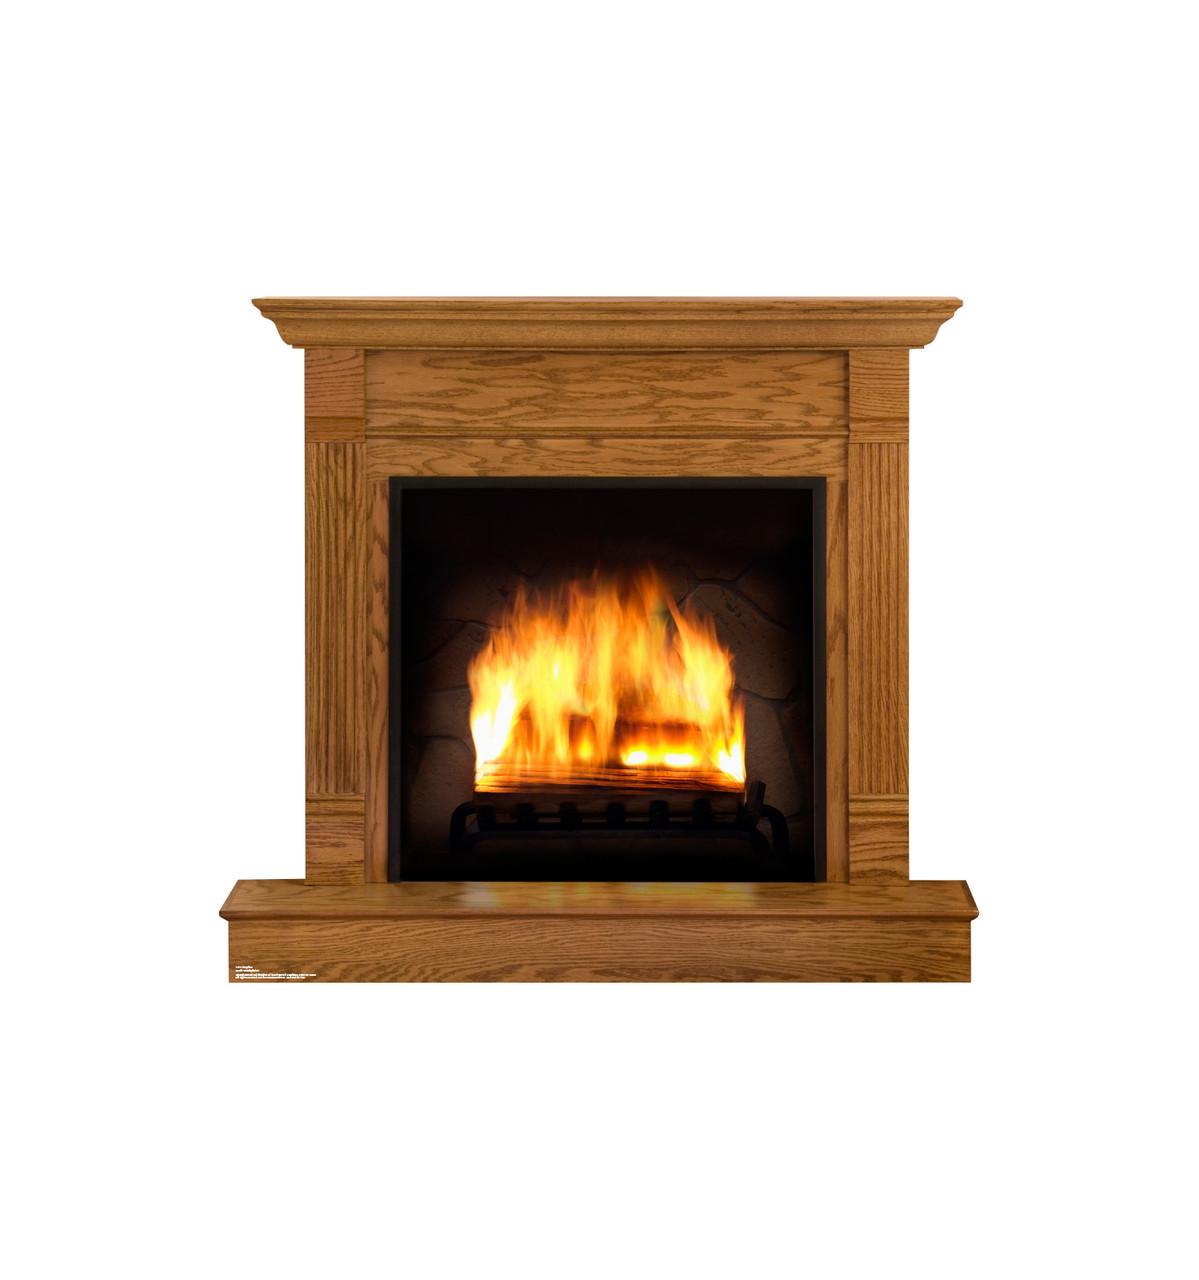 Fireplace Cardboard Cutout 2070